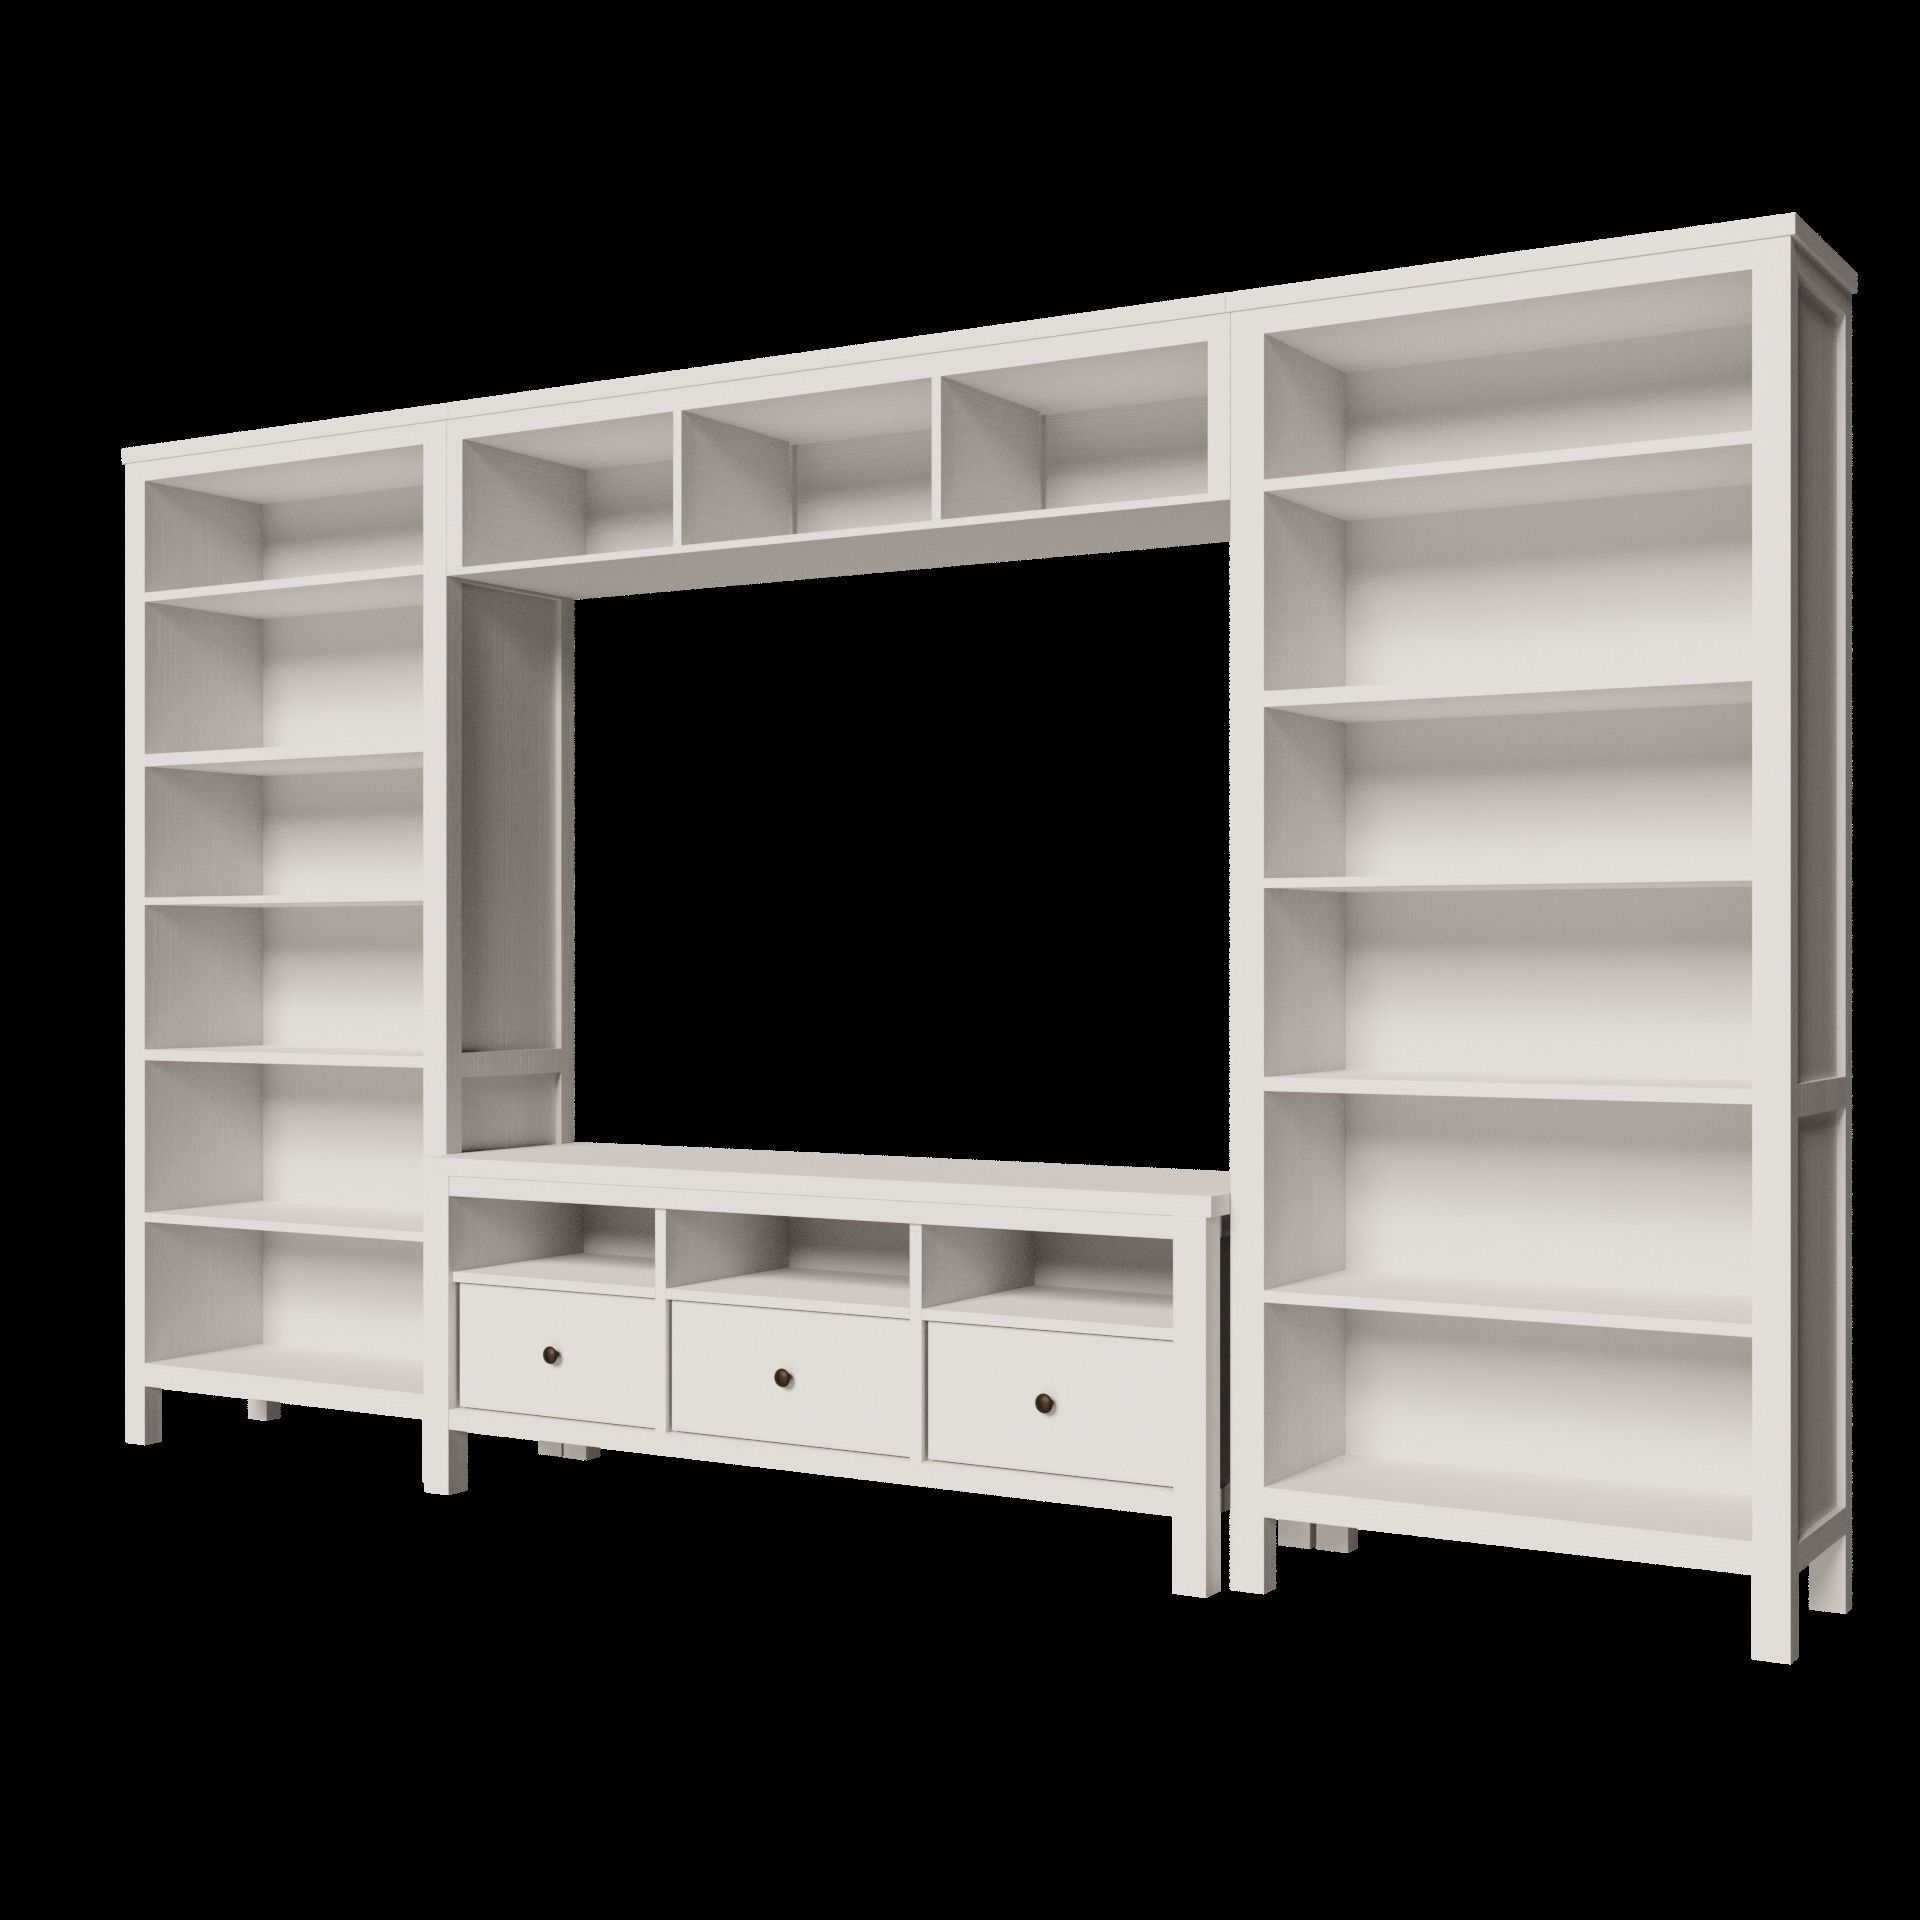 3d model ikea hemnes tv storage unit cabinets shelfs 2